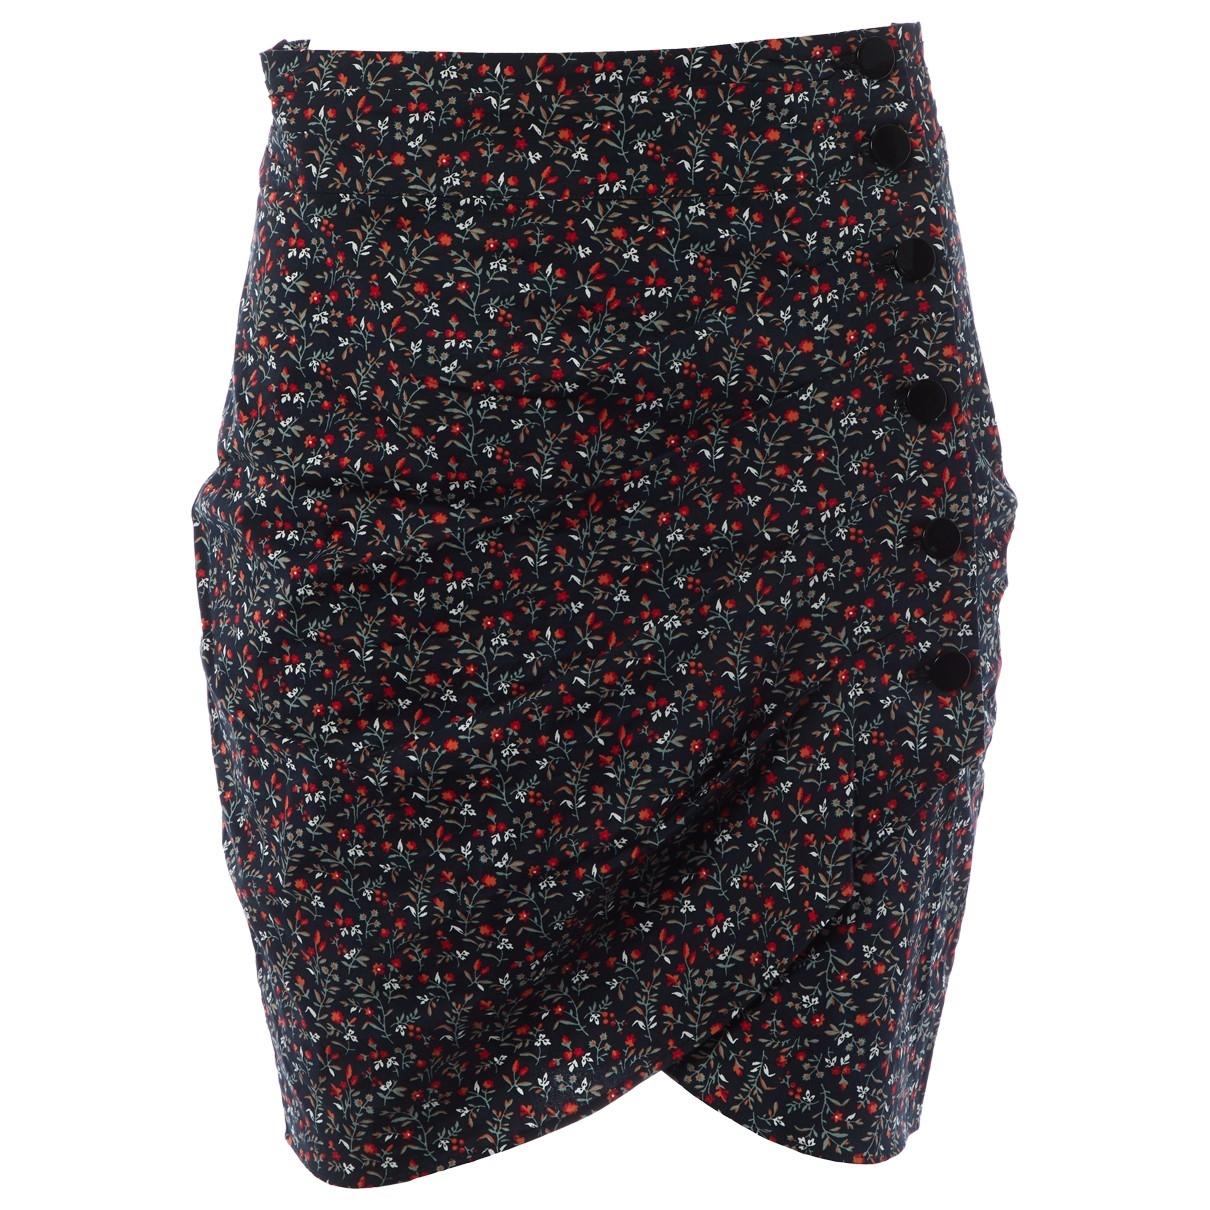 Ba&sh X Vestiaire Collective Sunshine Navy Cotton skirt for Women 0 0-5